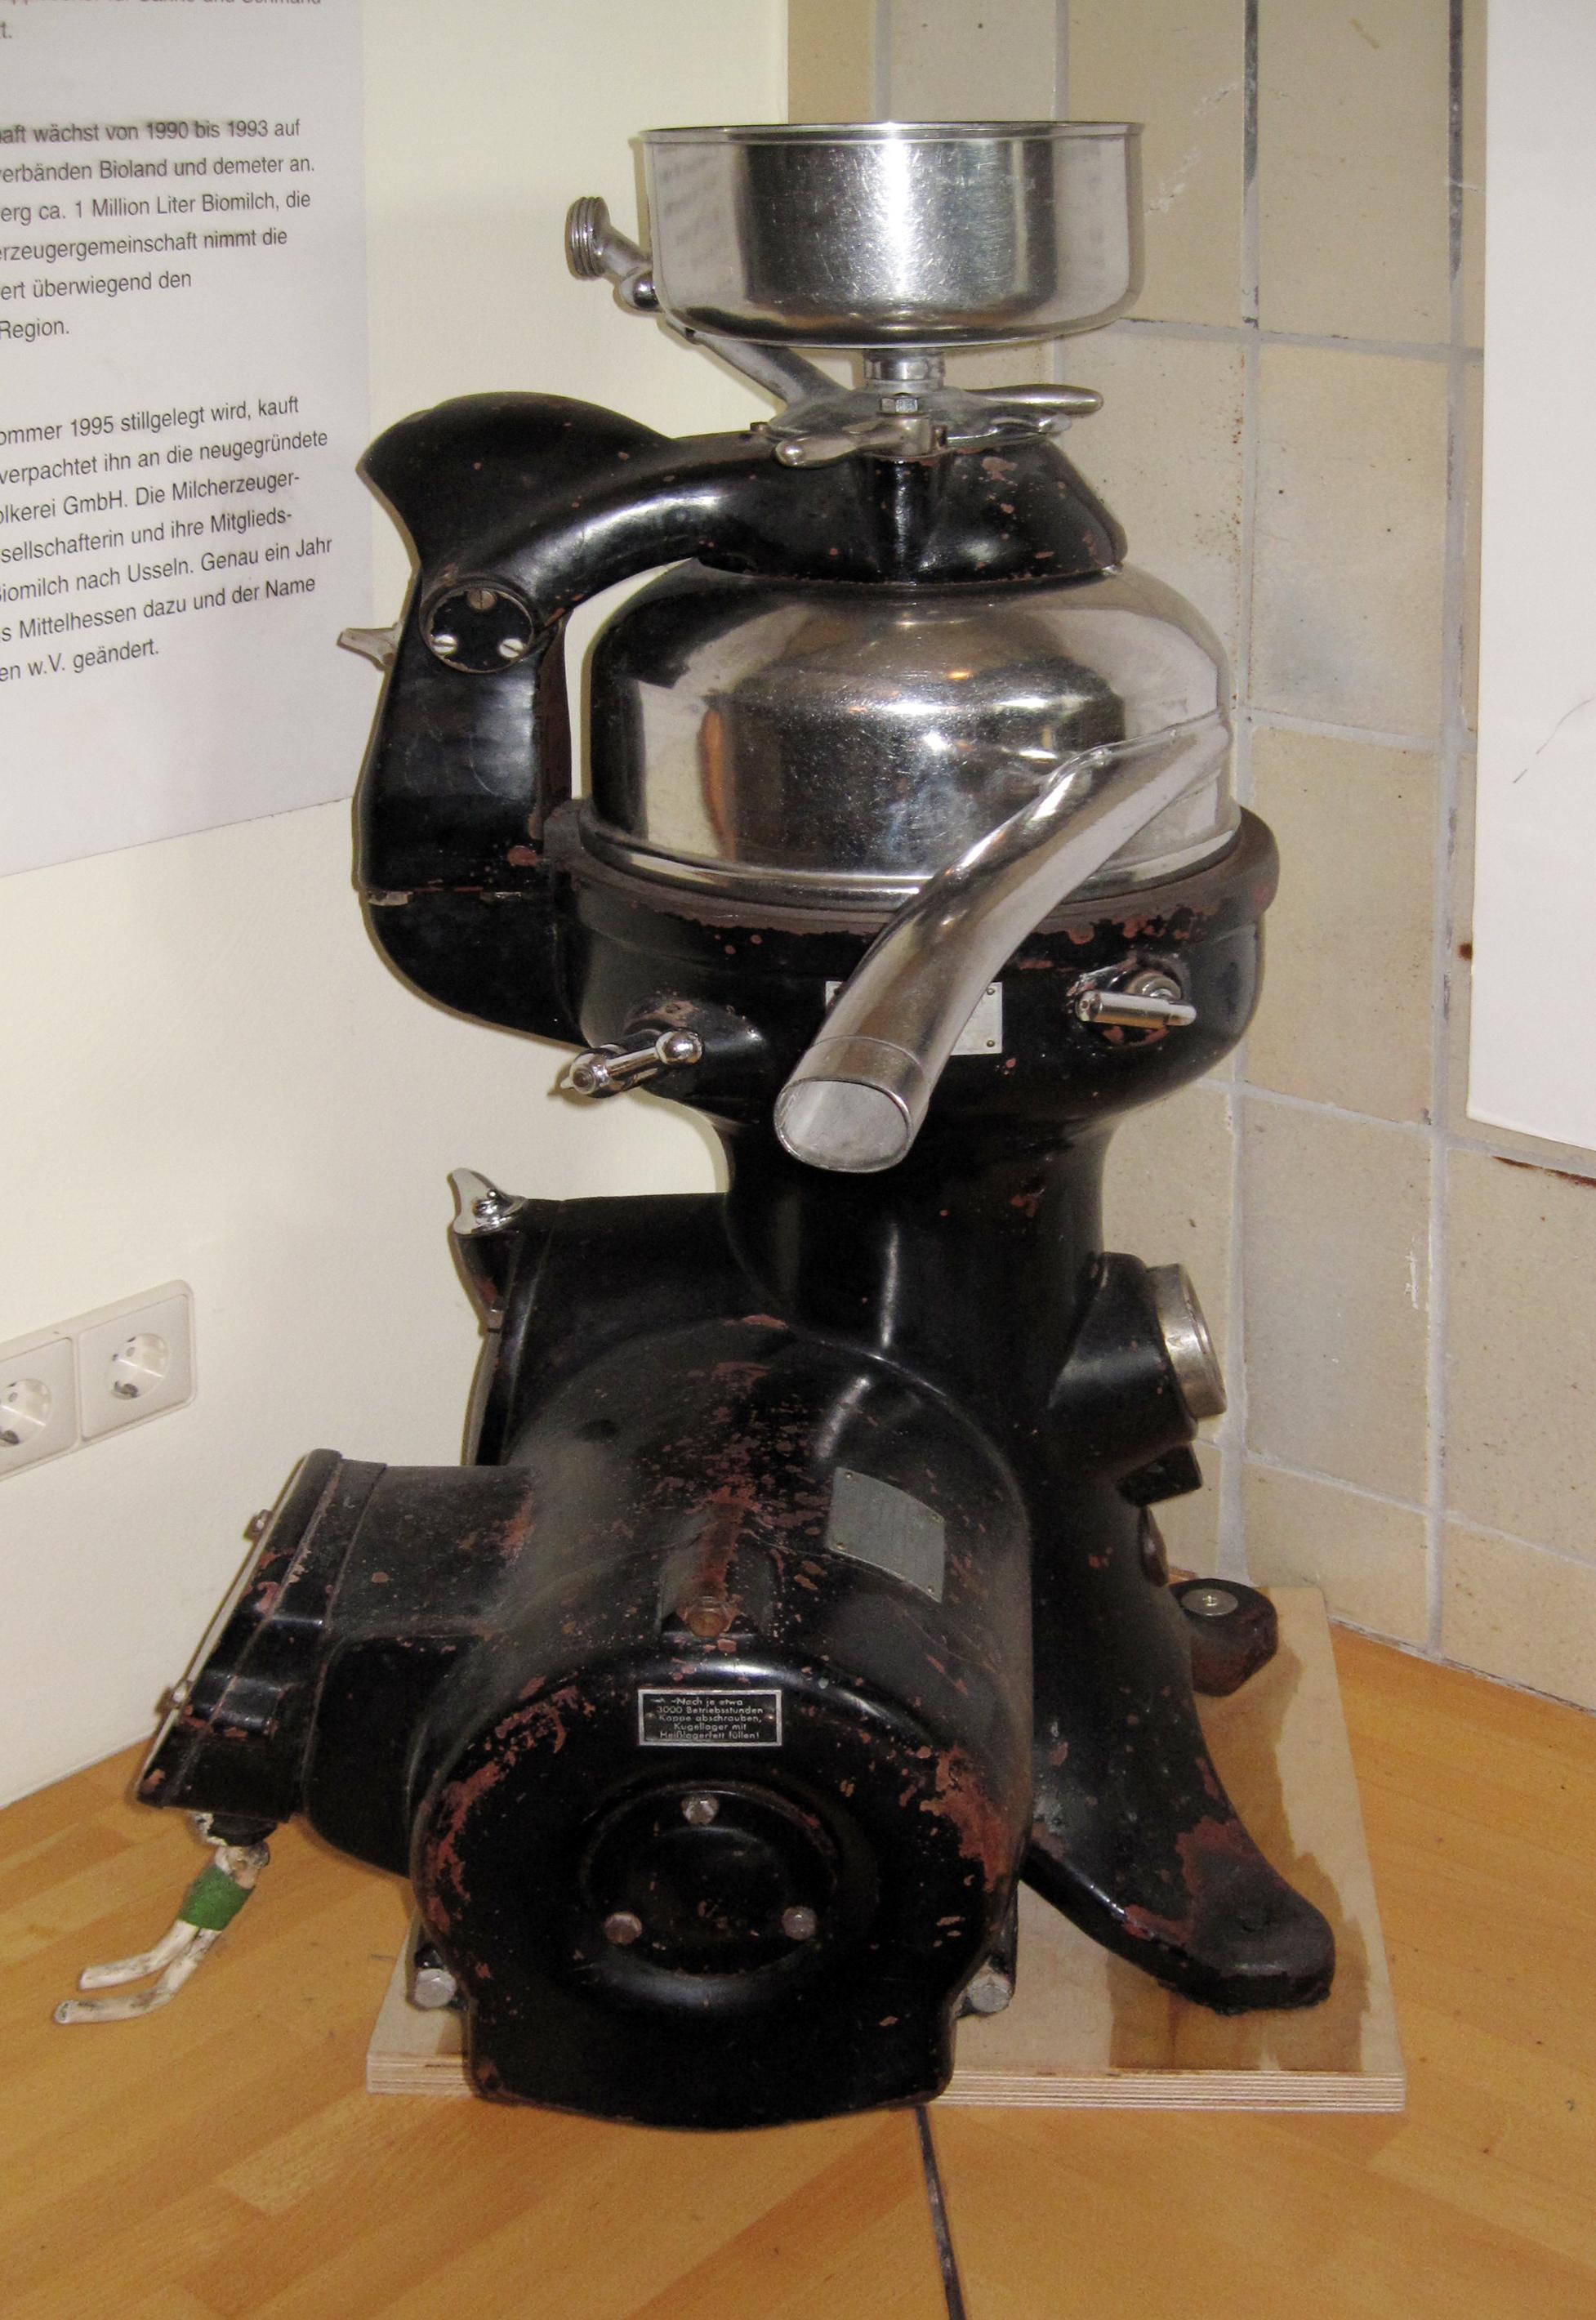 Datei Willingen Usseln Milchmuhseum Zentrifuge motorbetrieben